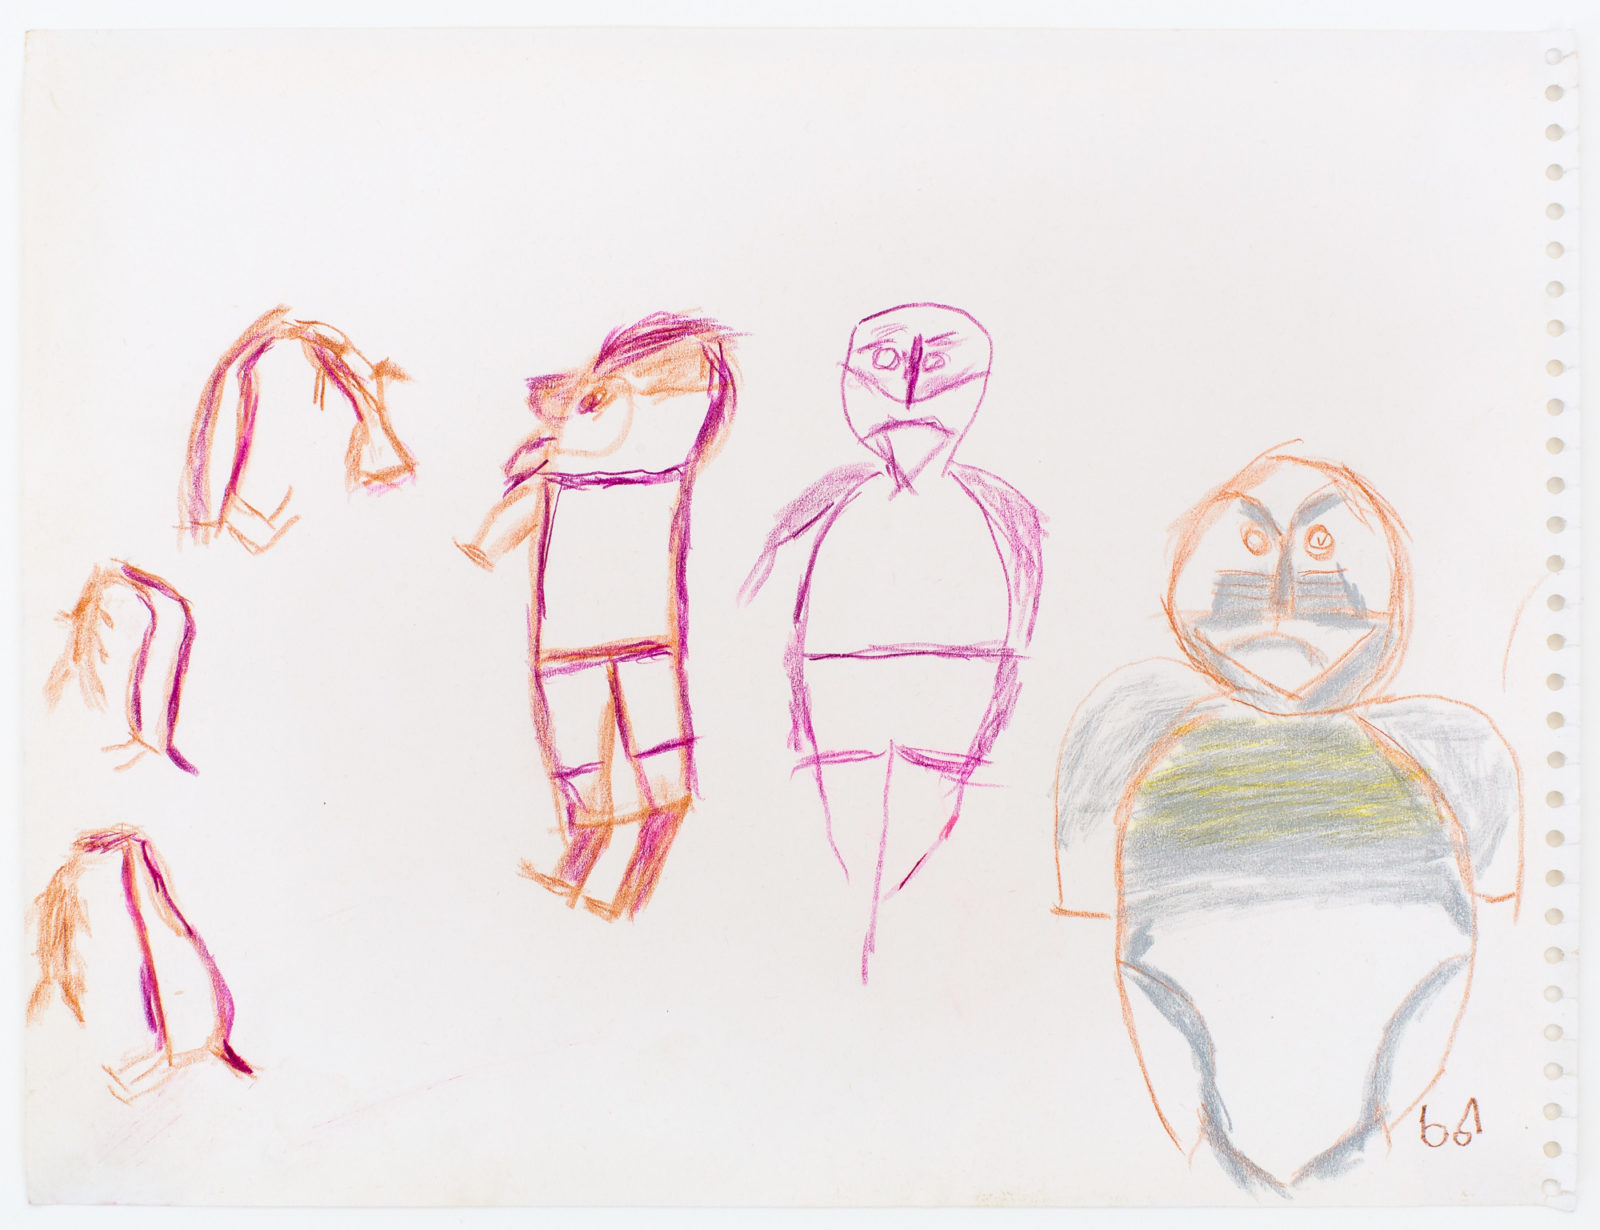 John Kavik - untitled (three figures and three gulls)